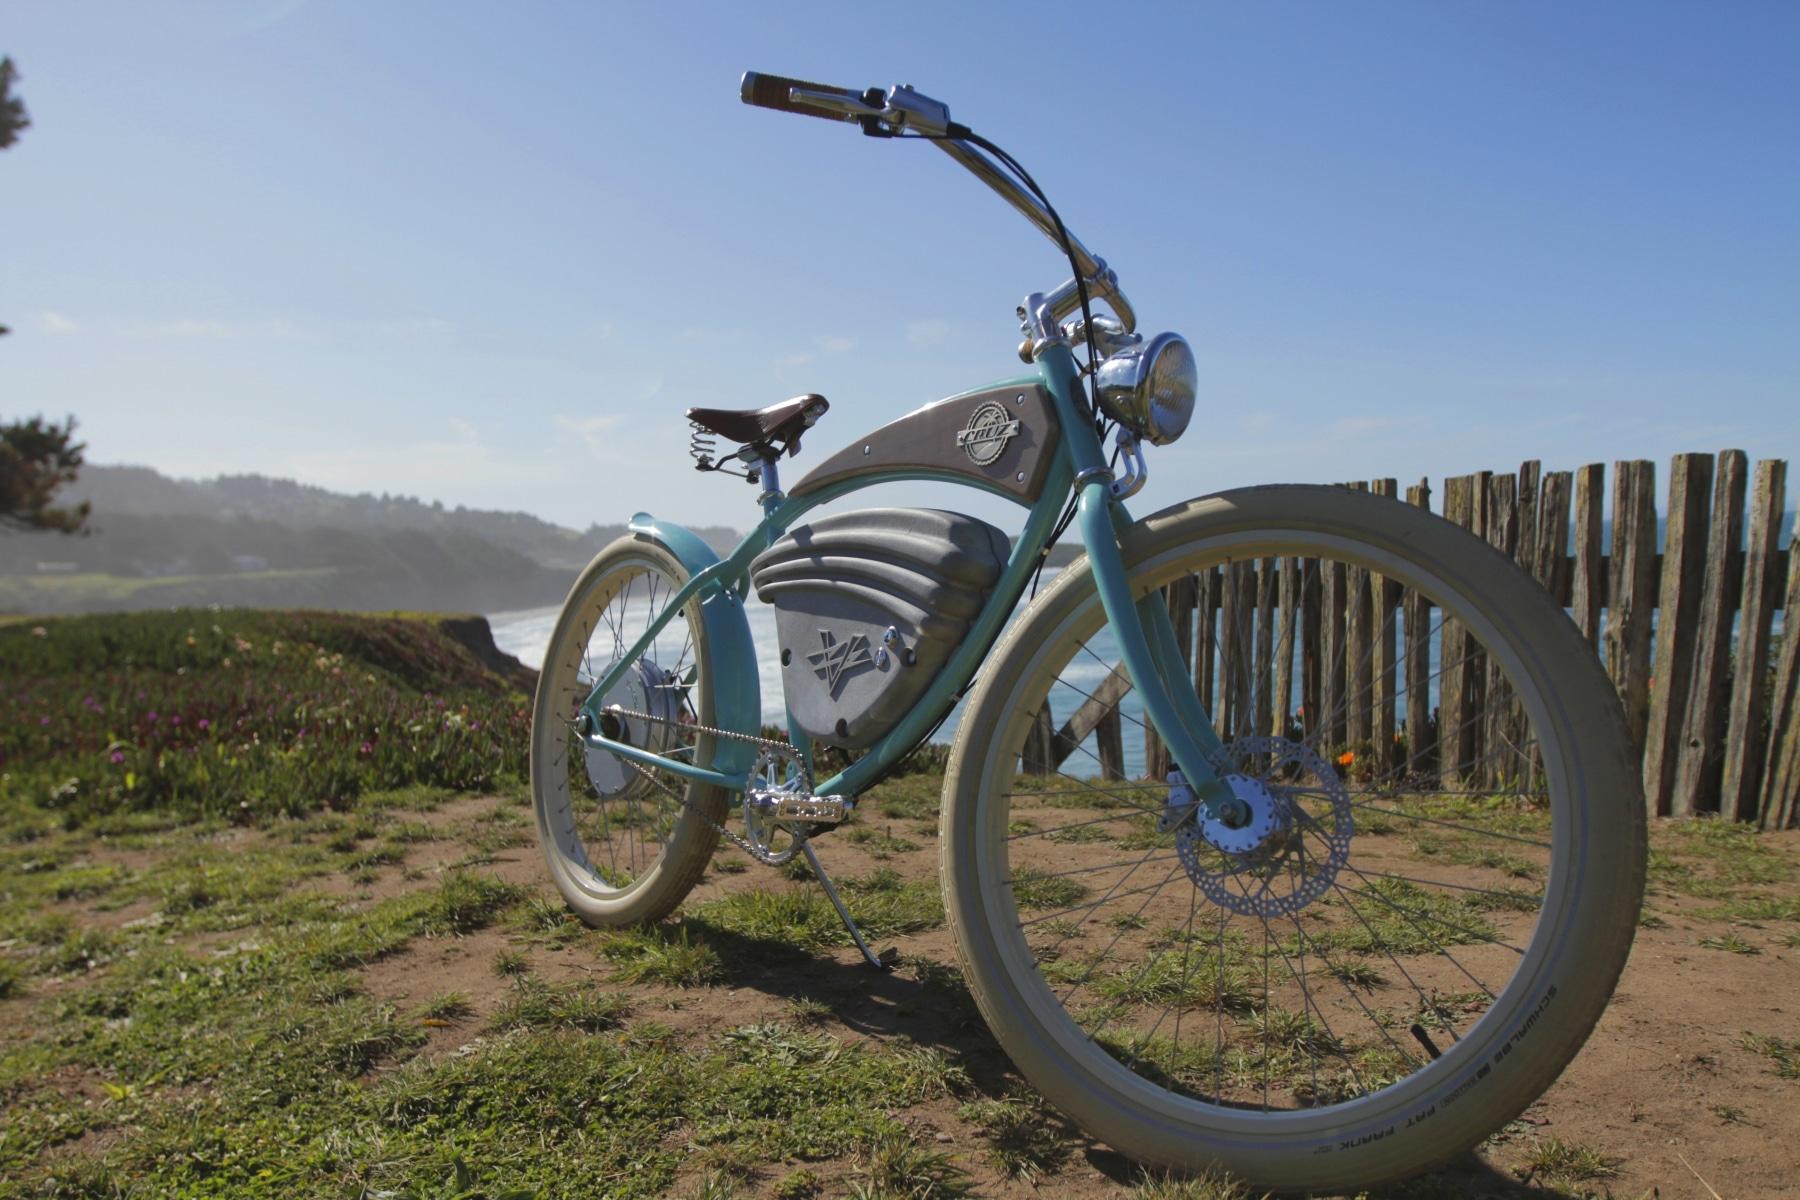 aqua ted cruz vintage electric bikes